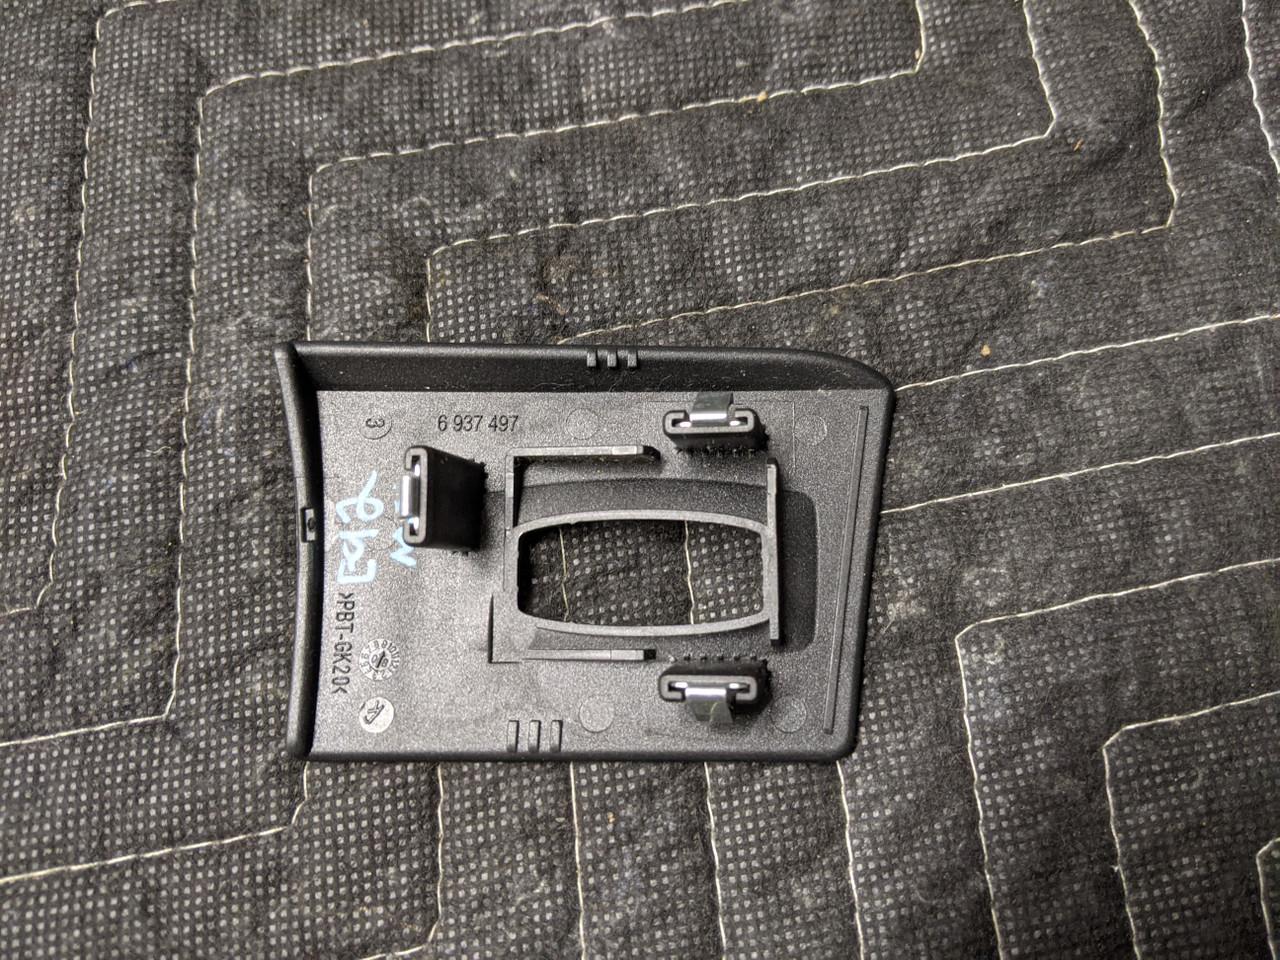 BMW E92 3-Series Ignition Lock Key Trim Cover Schwarz 6937497